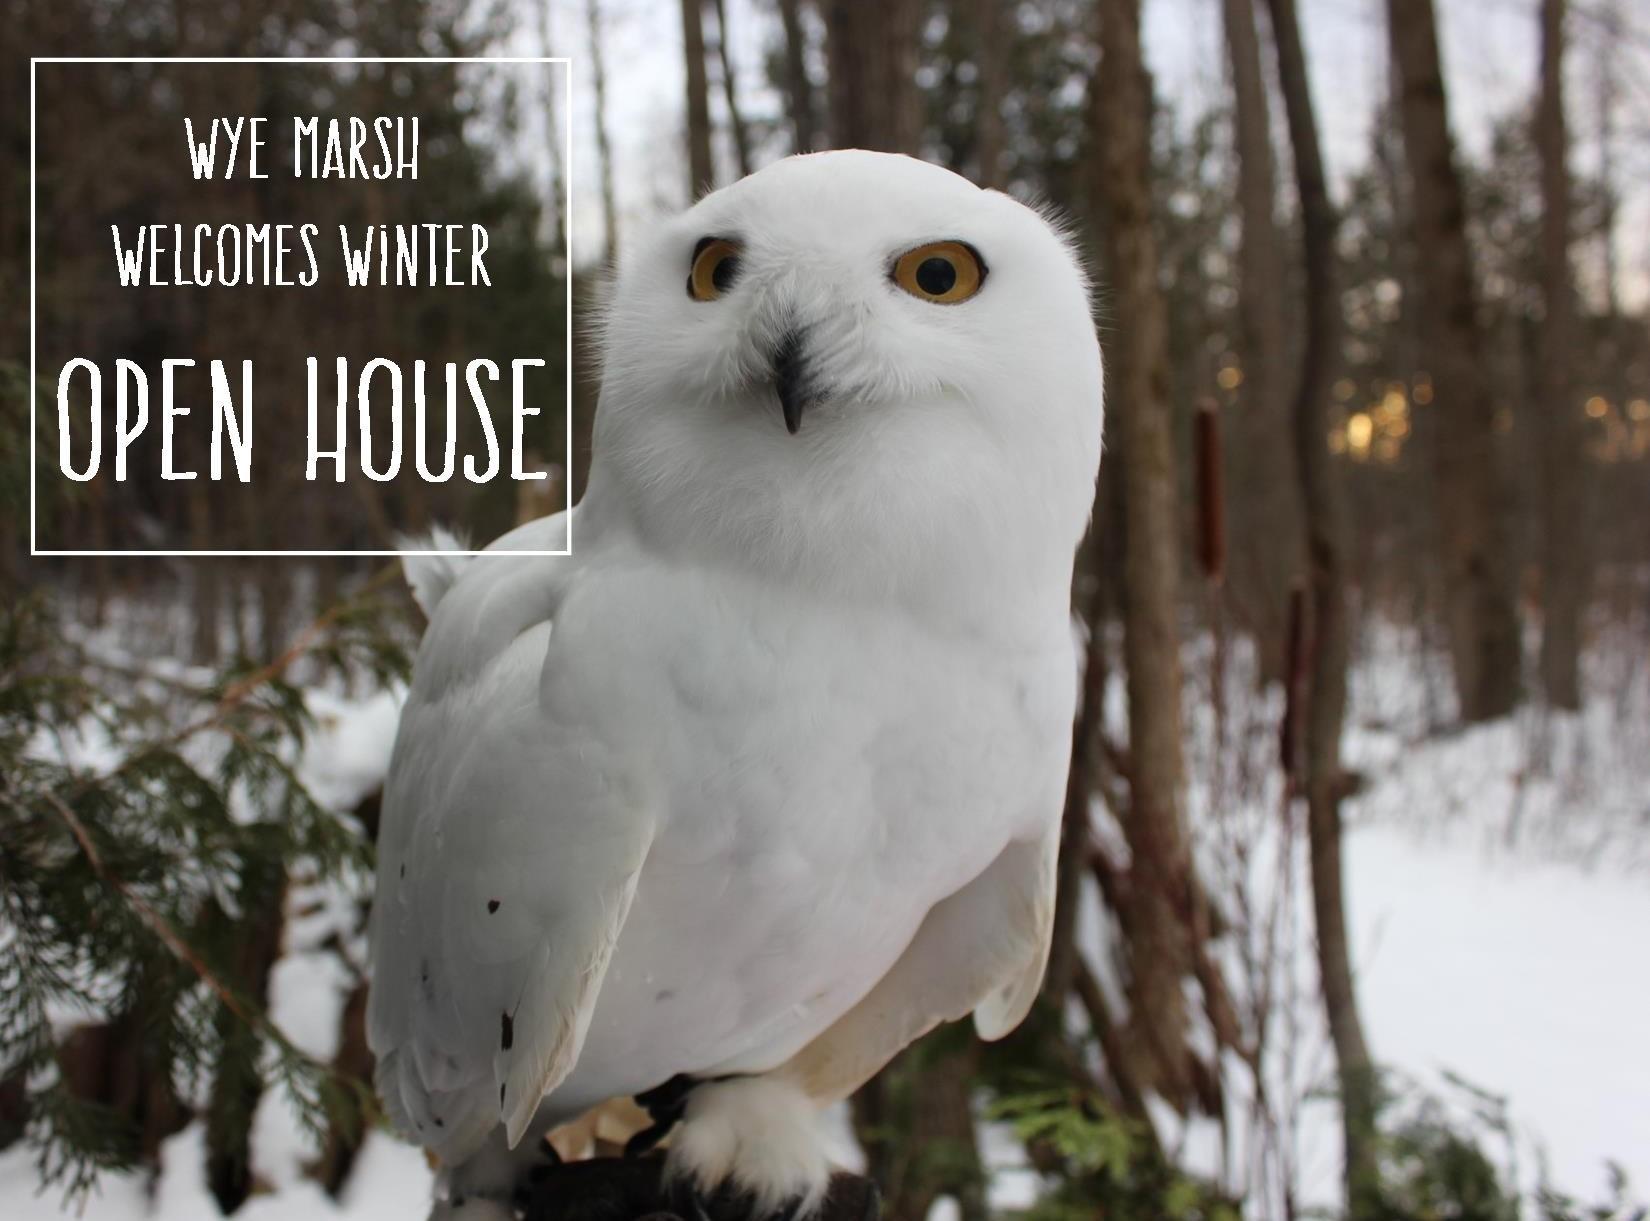 WMWW Open House - Wye Marsh Welcomes Winter Open House